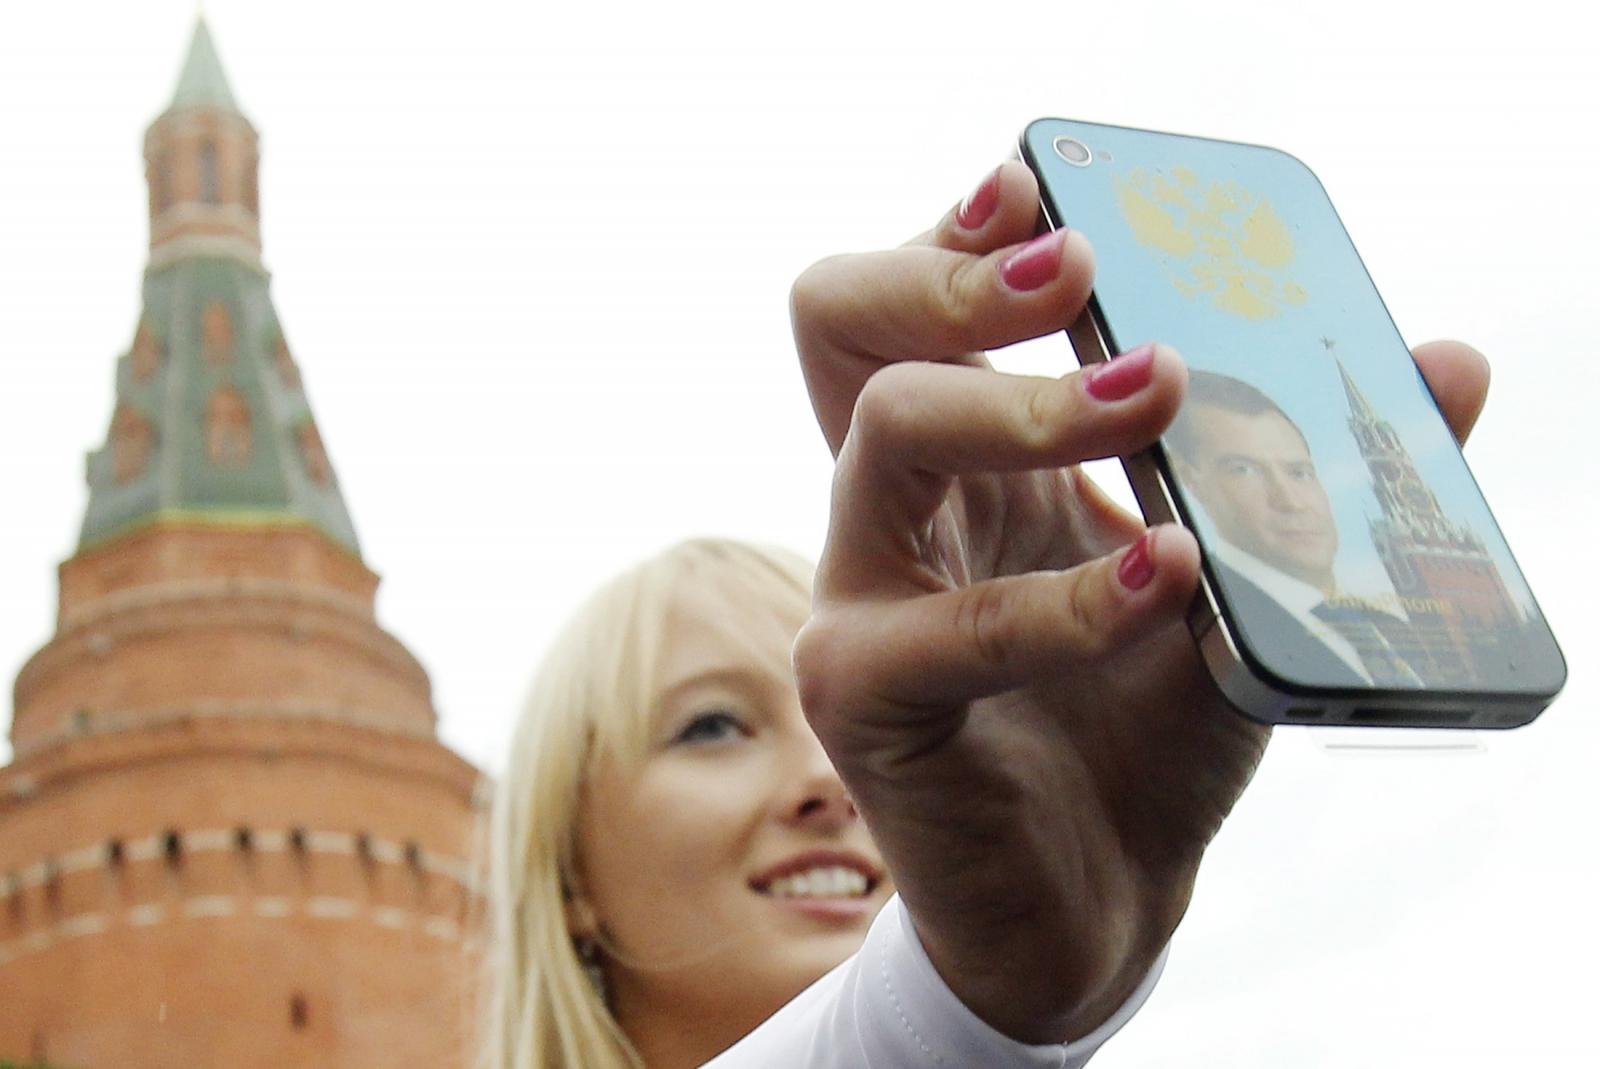 russia iphone ipad ban